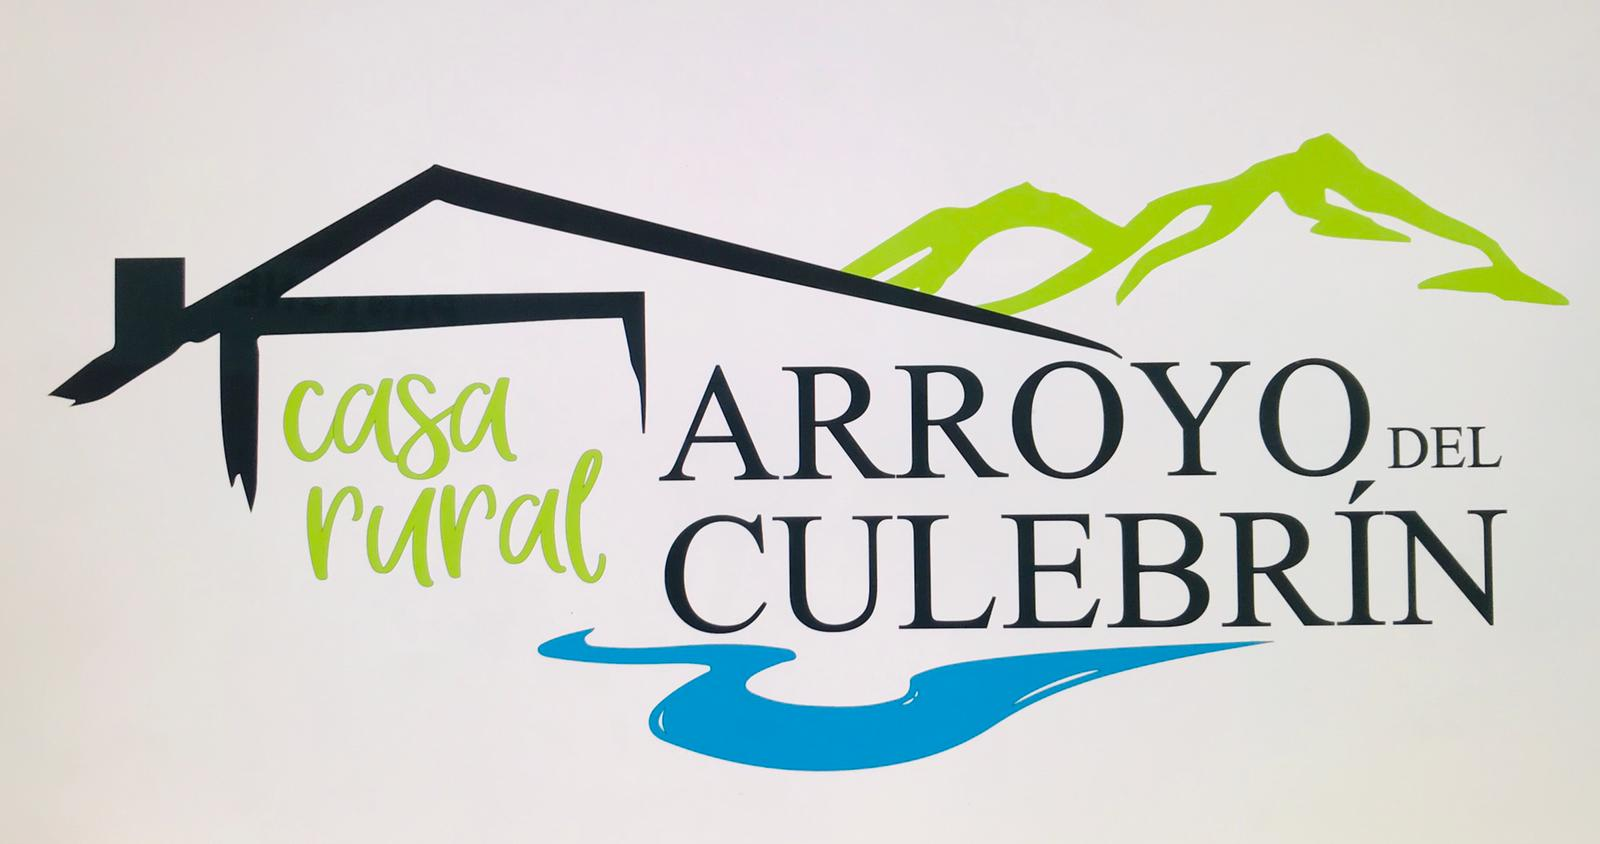 Casa Rural Arroyo del Culebrin